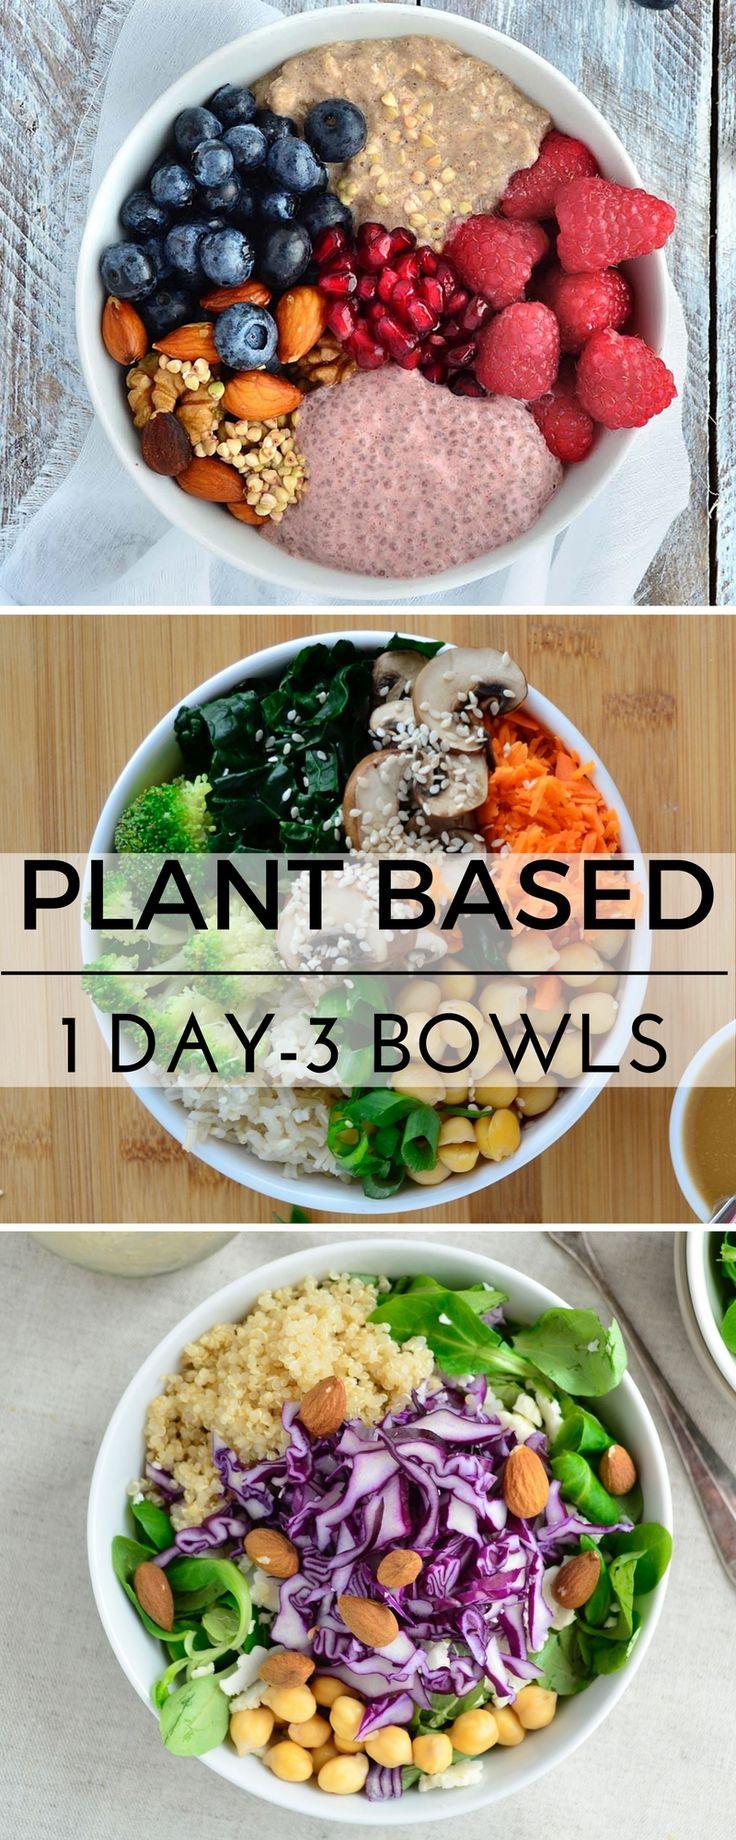 Healthy Raw Vegan Recipes  Plant based recipes vegan recipes healthy gluten free